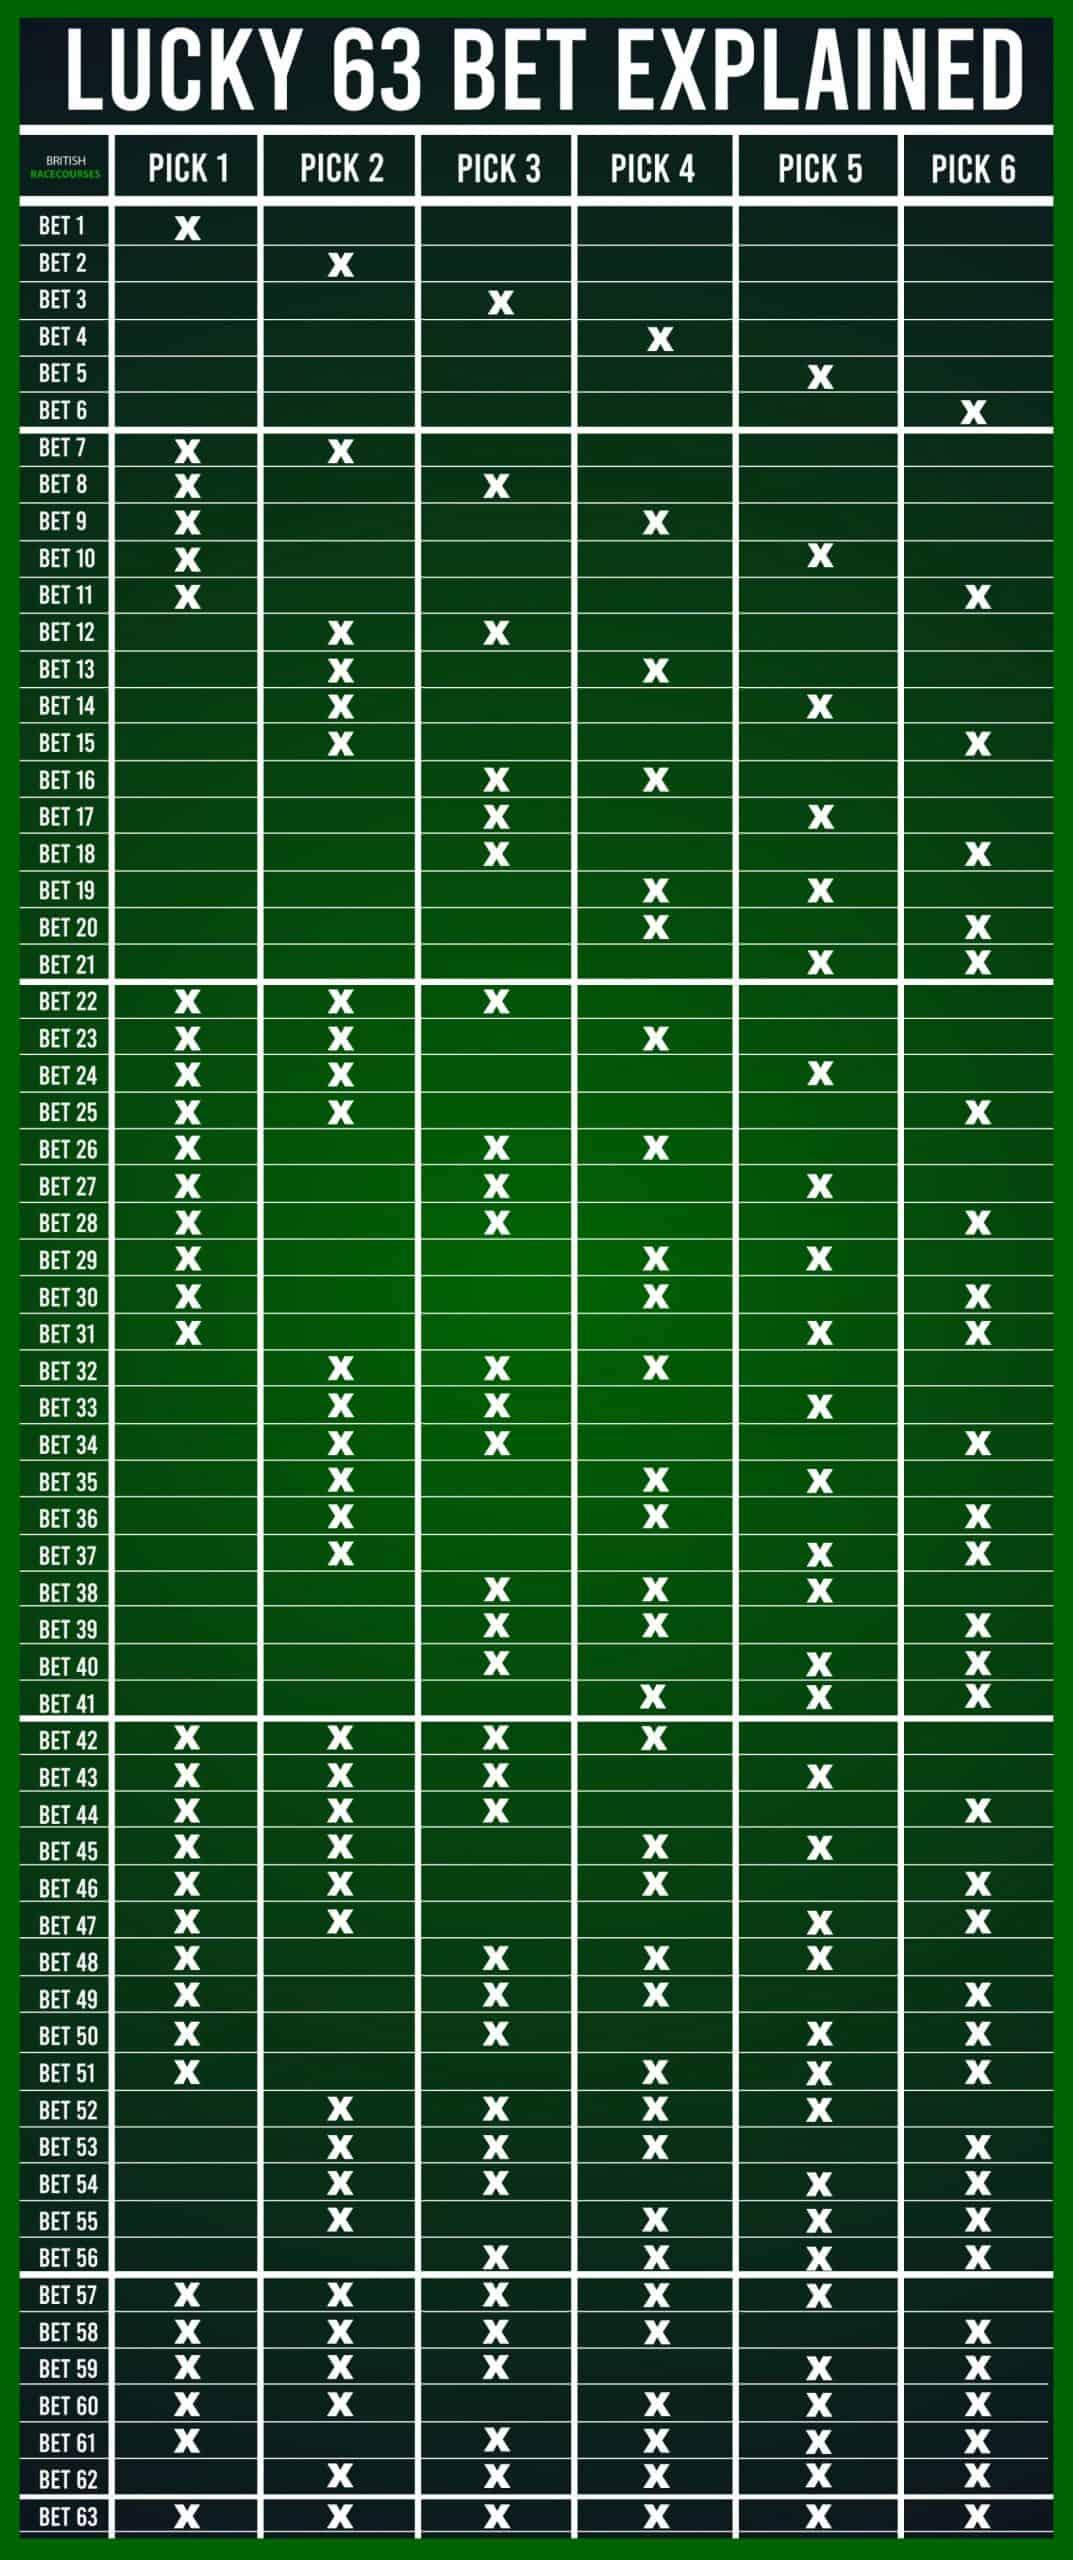 British Racecourses Lucky 63 Bet Explained